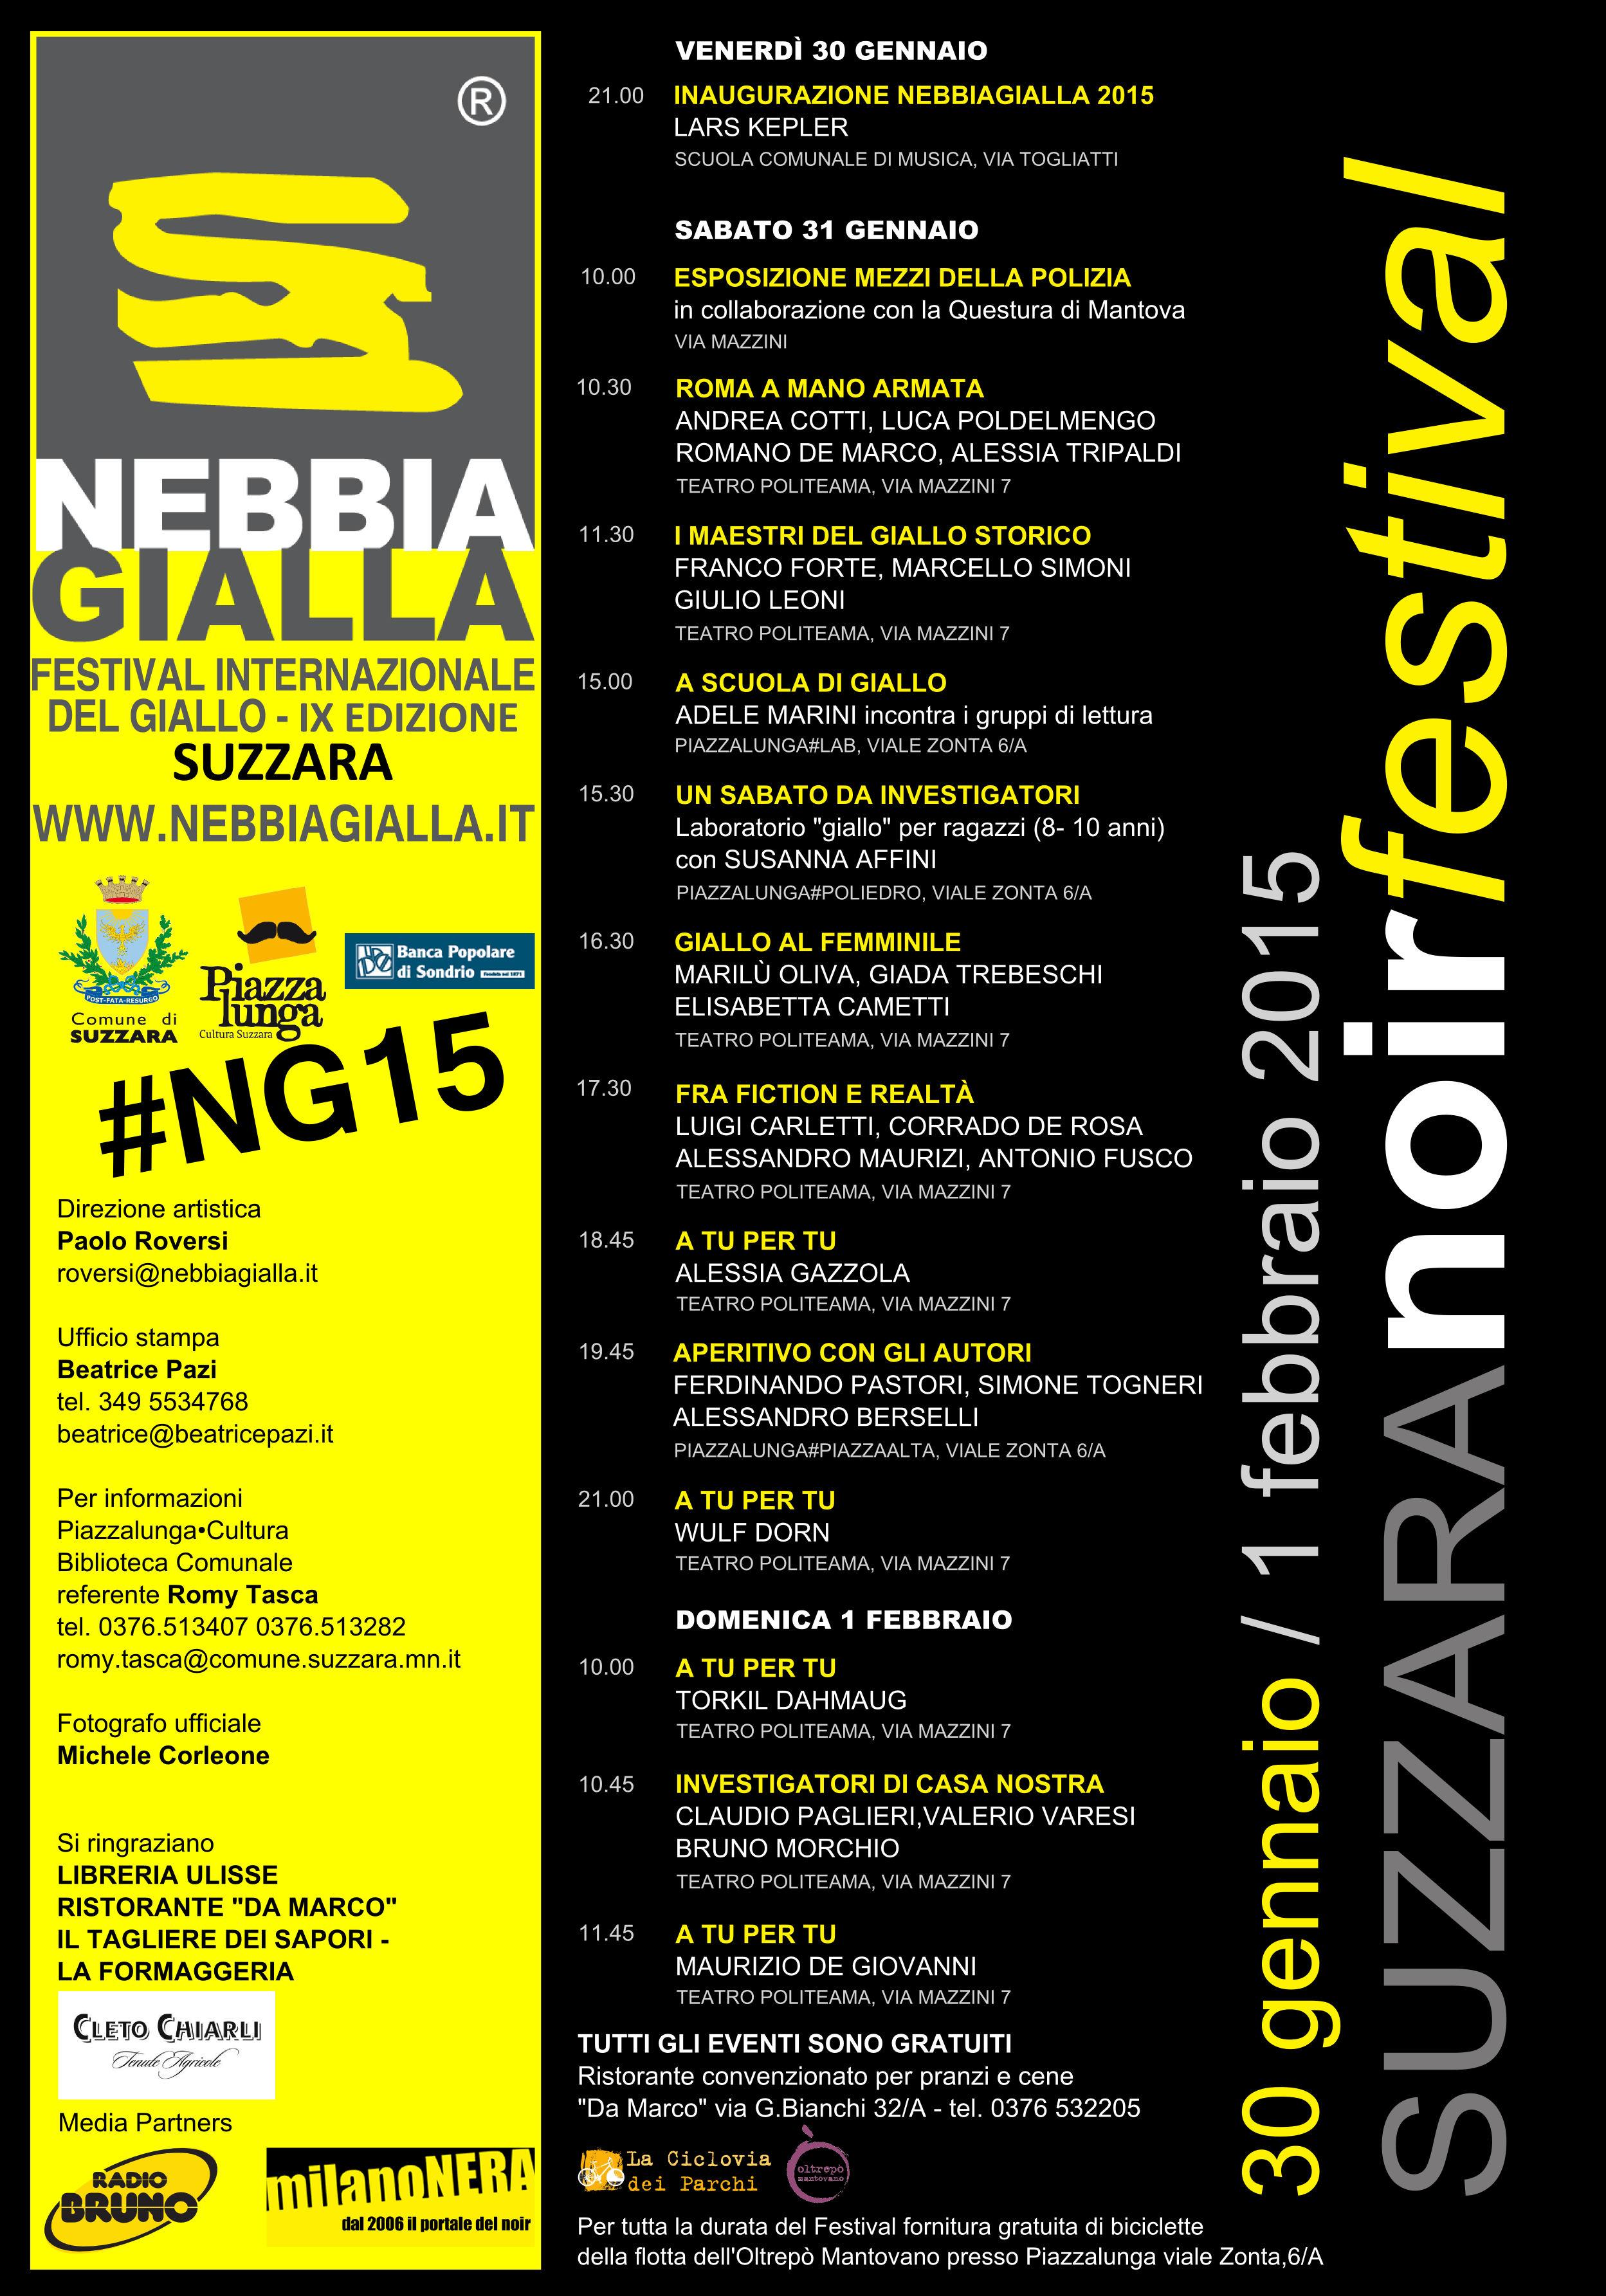 http://hotmag.me/nebbiagialla/files/2015/01/programma_nebbiagialla_2015.jpg